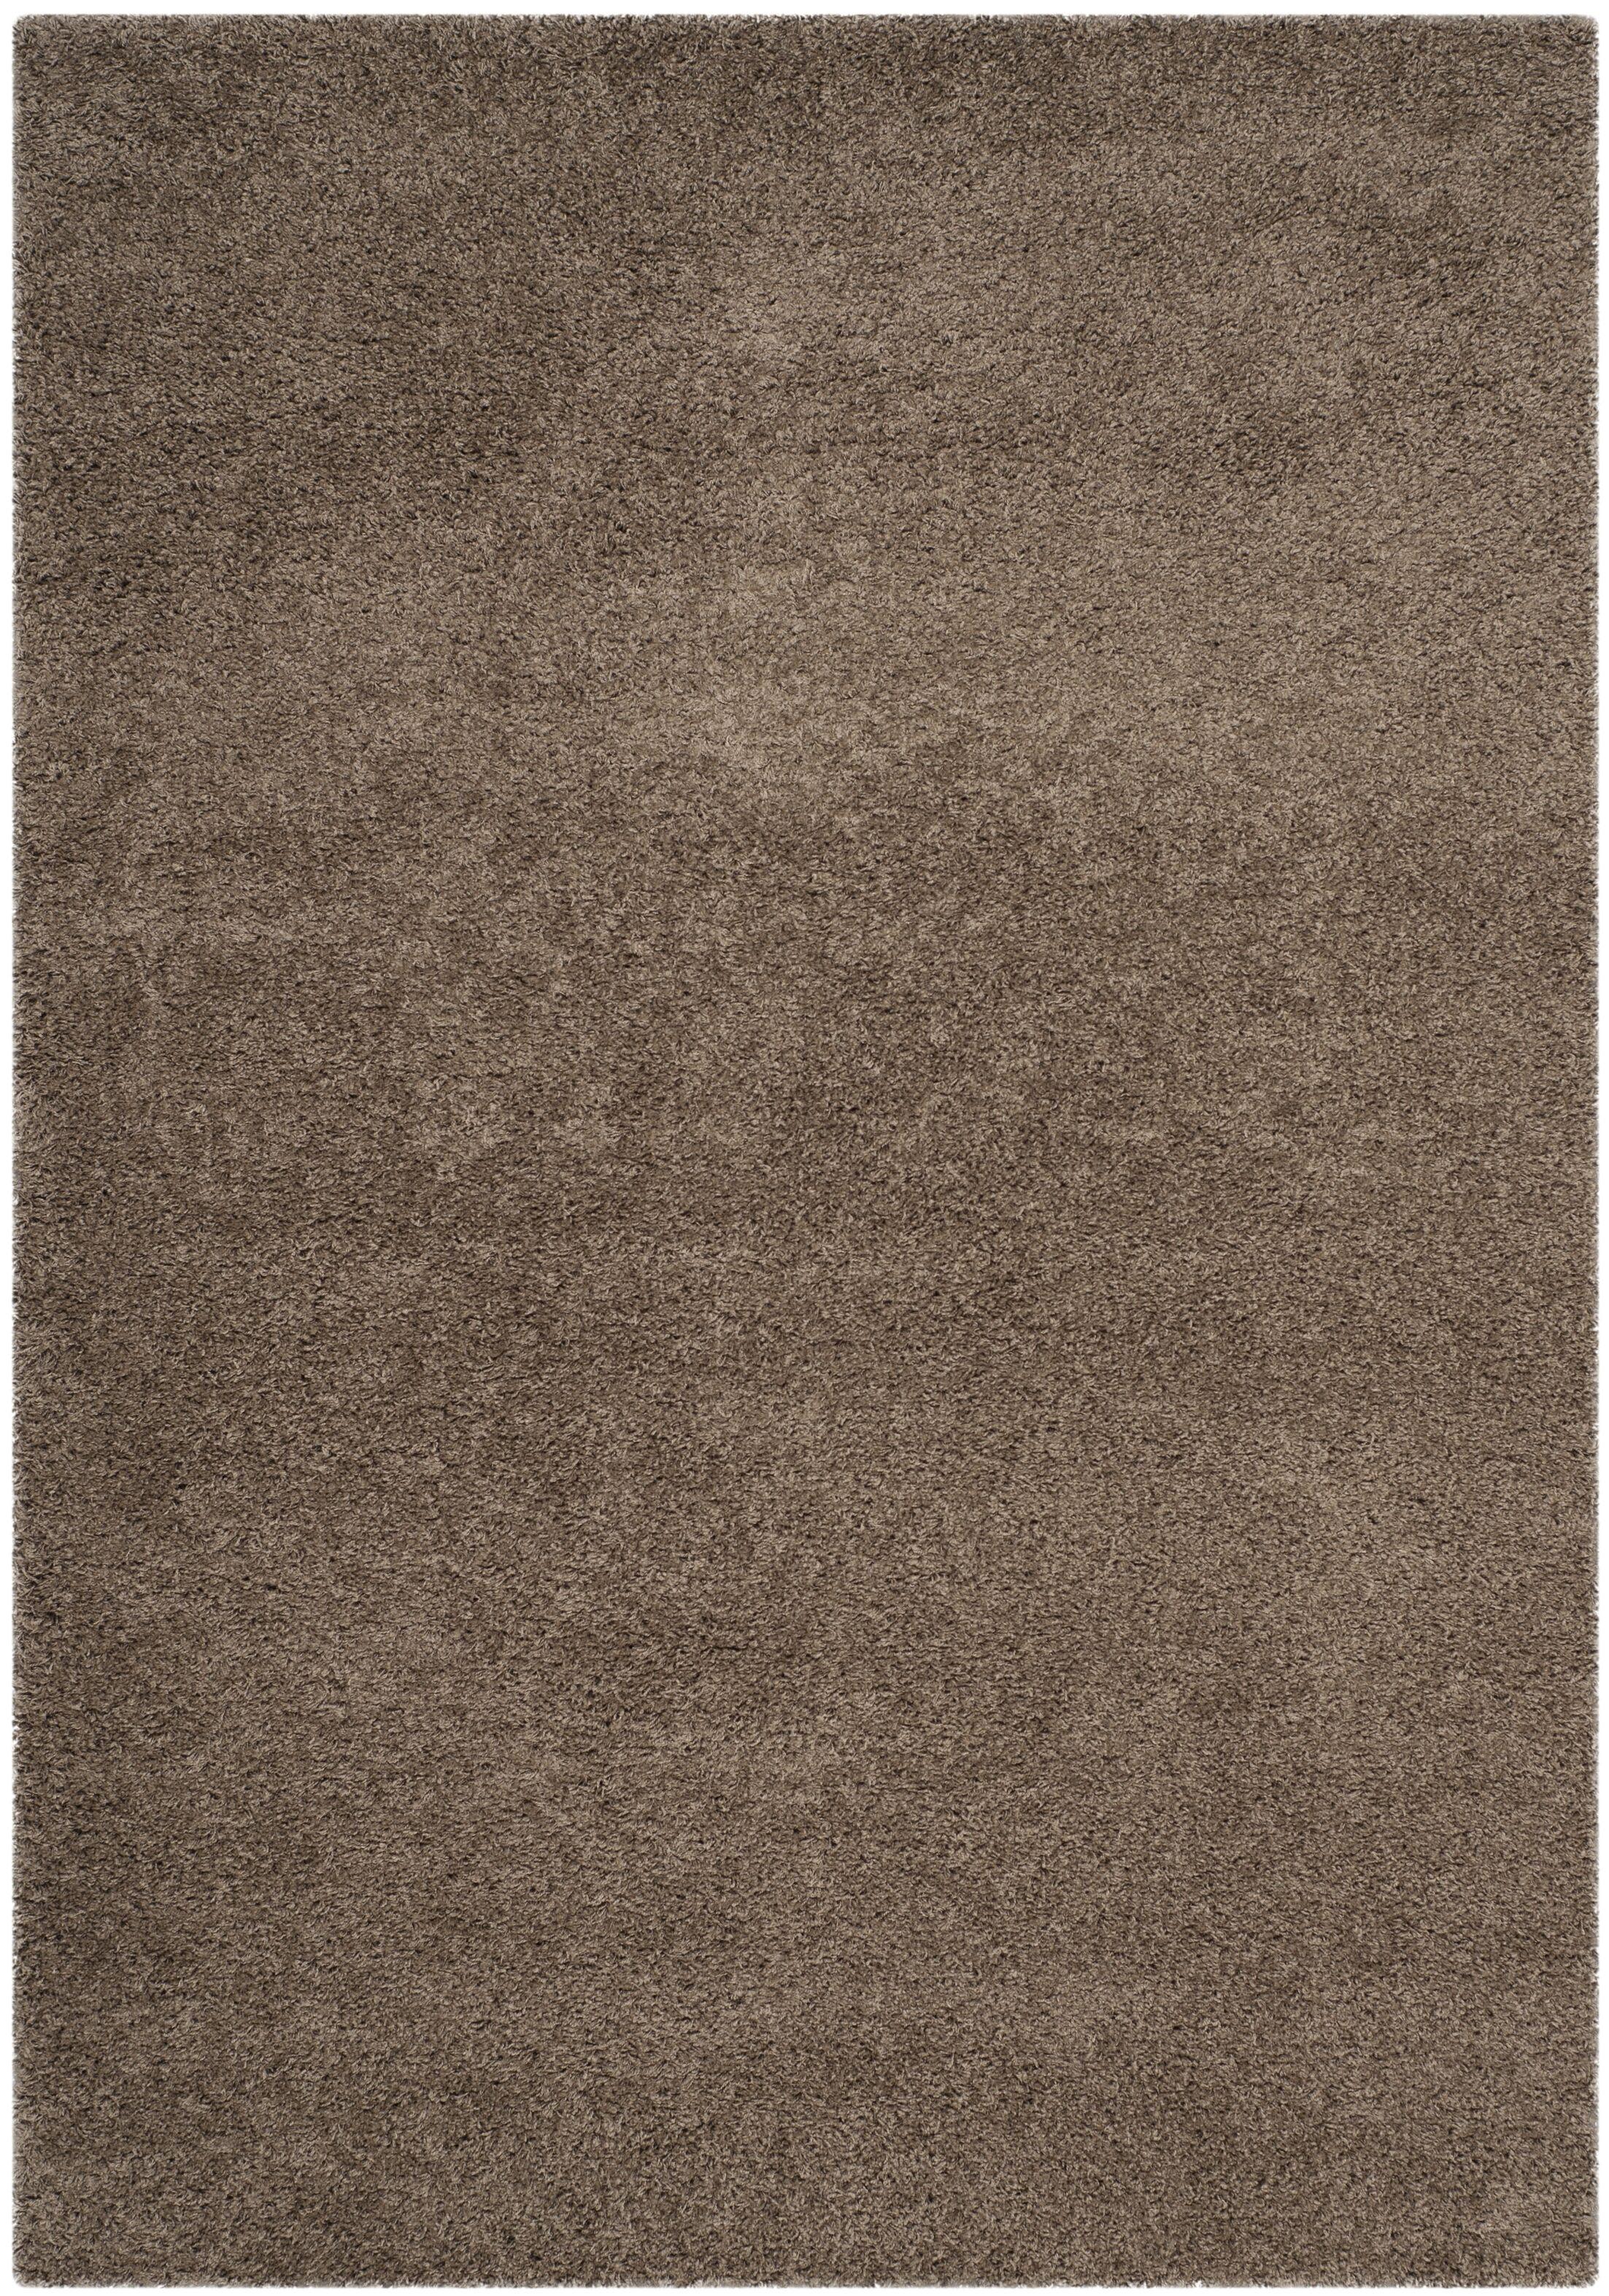 Nickols Shag Taupe Area Rug Rug Size: Rectangle 4' x 6'